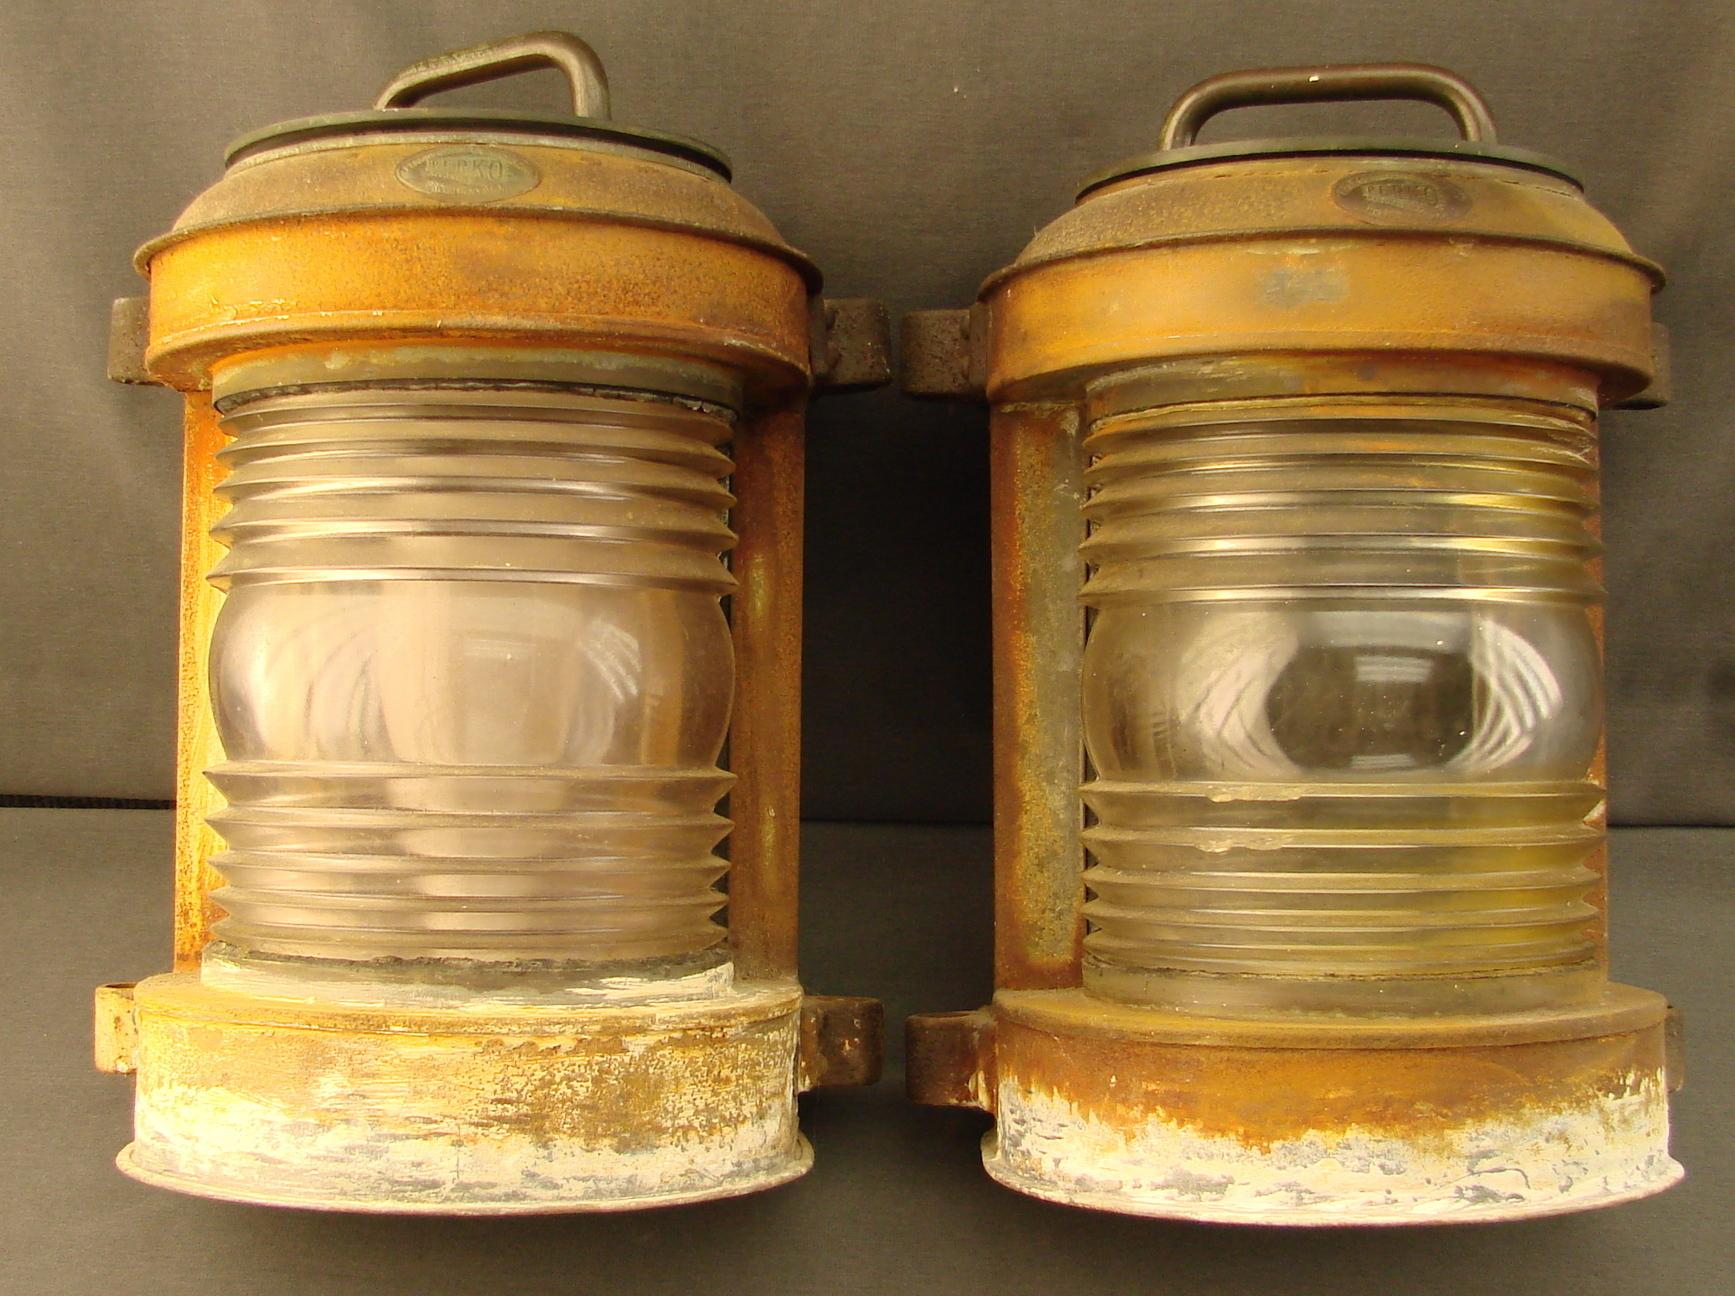 Pair Of Perkins Electrified Marine Lamps